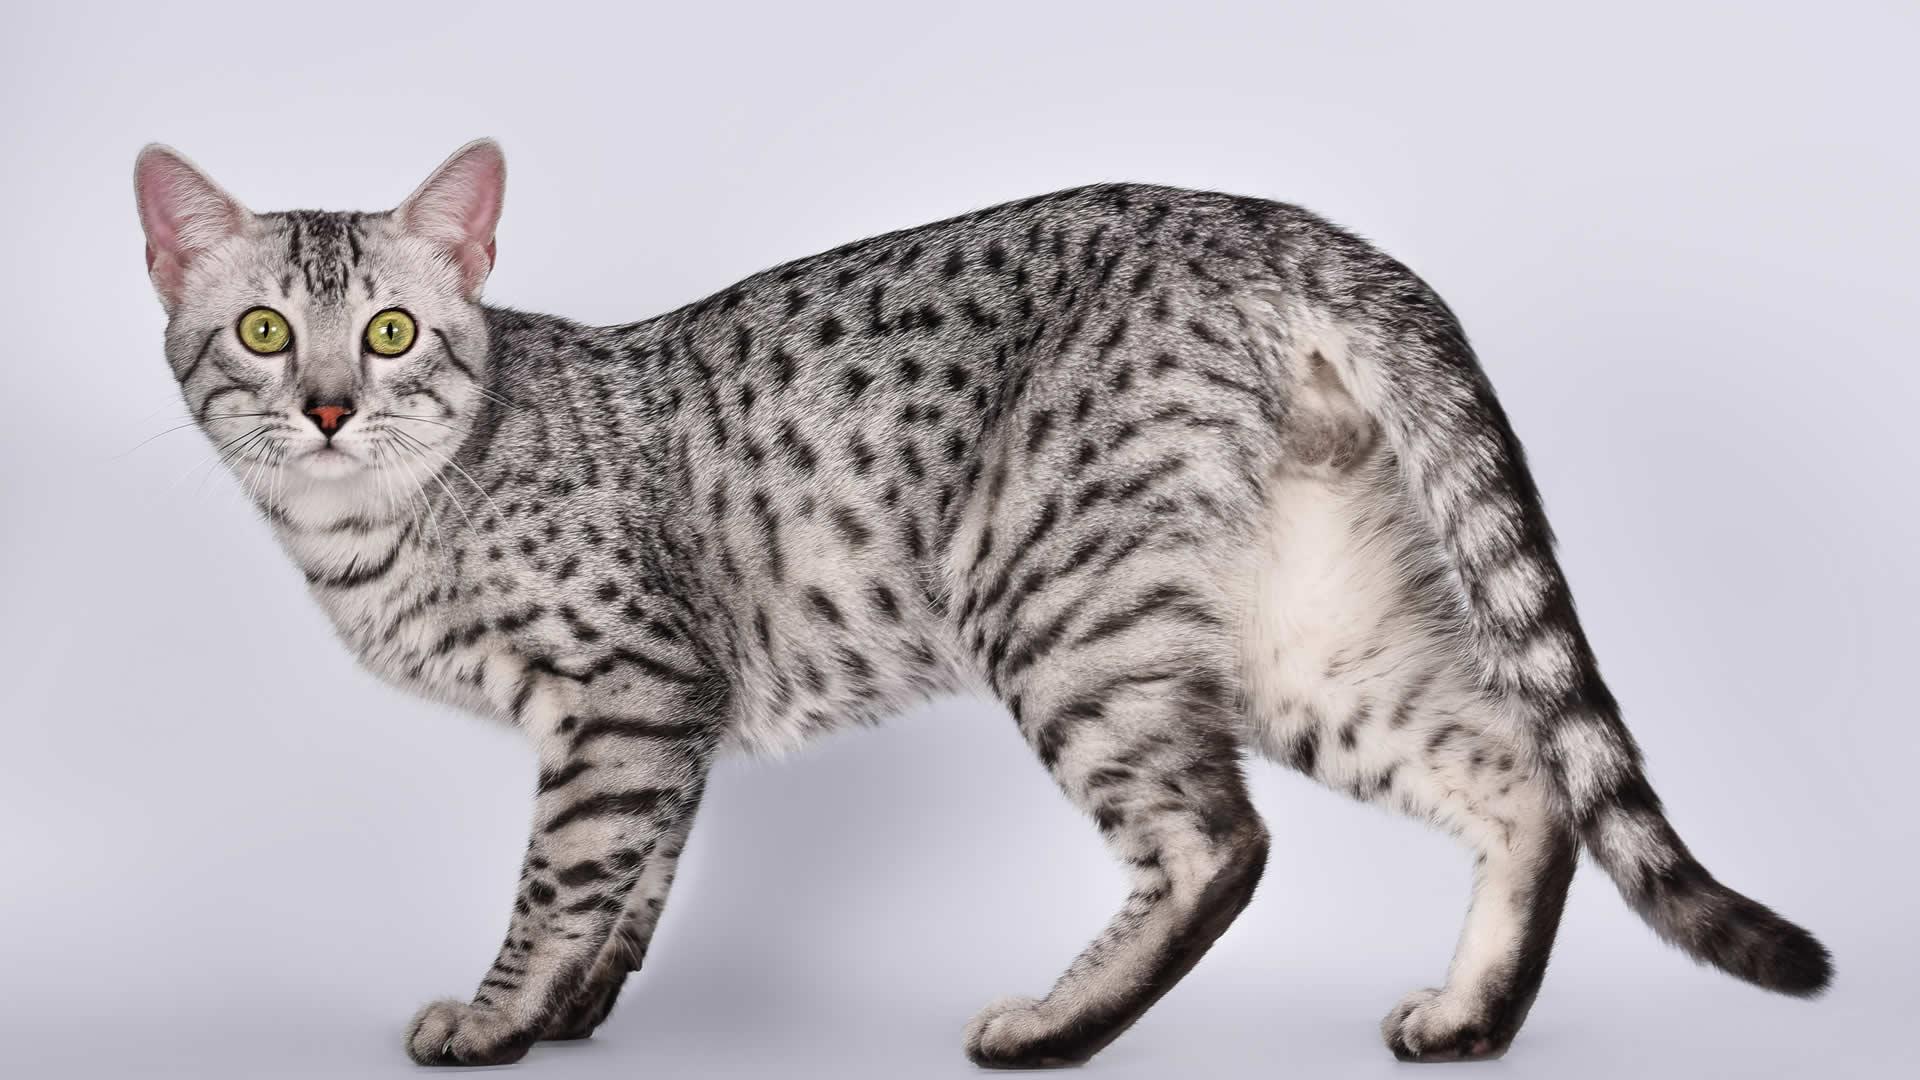 Egyptian Mau long tail cat breed